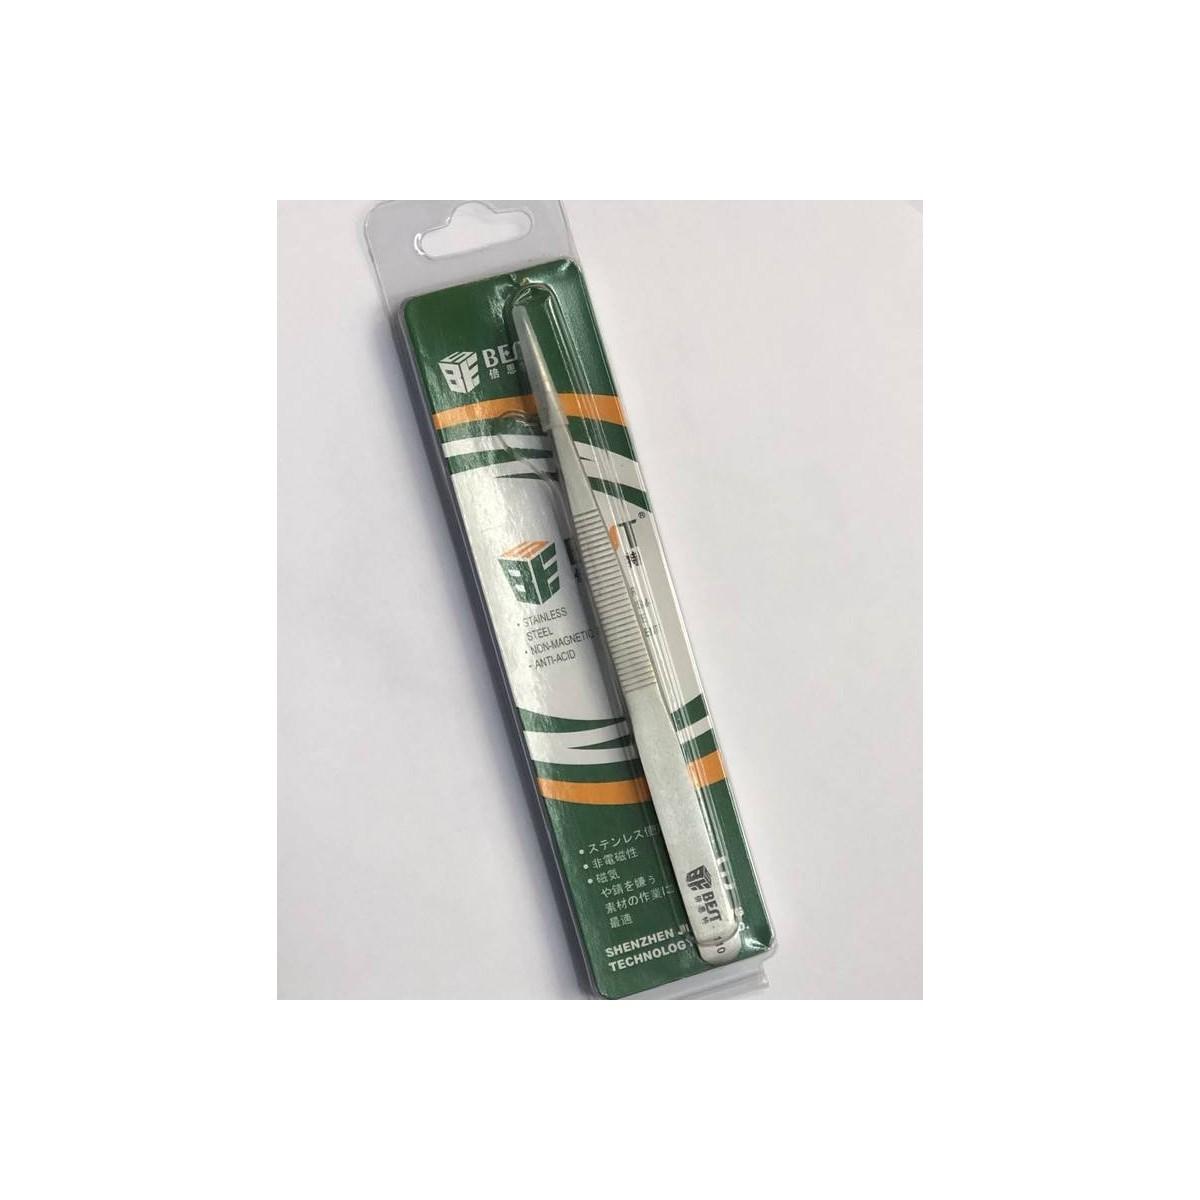 pinzas BEST-110 de acero inixidable